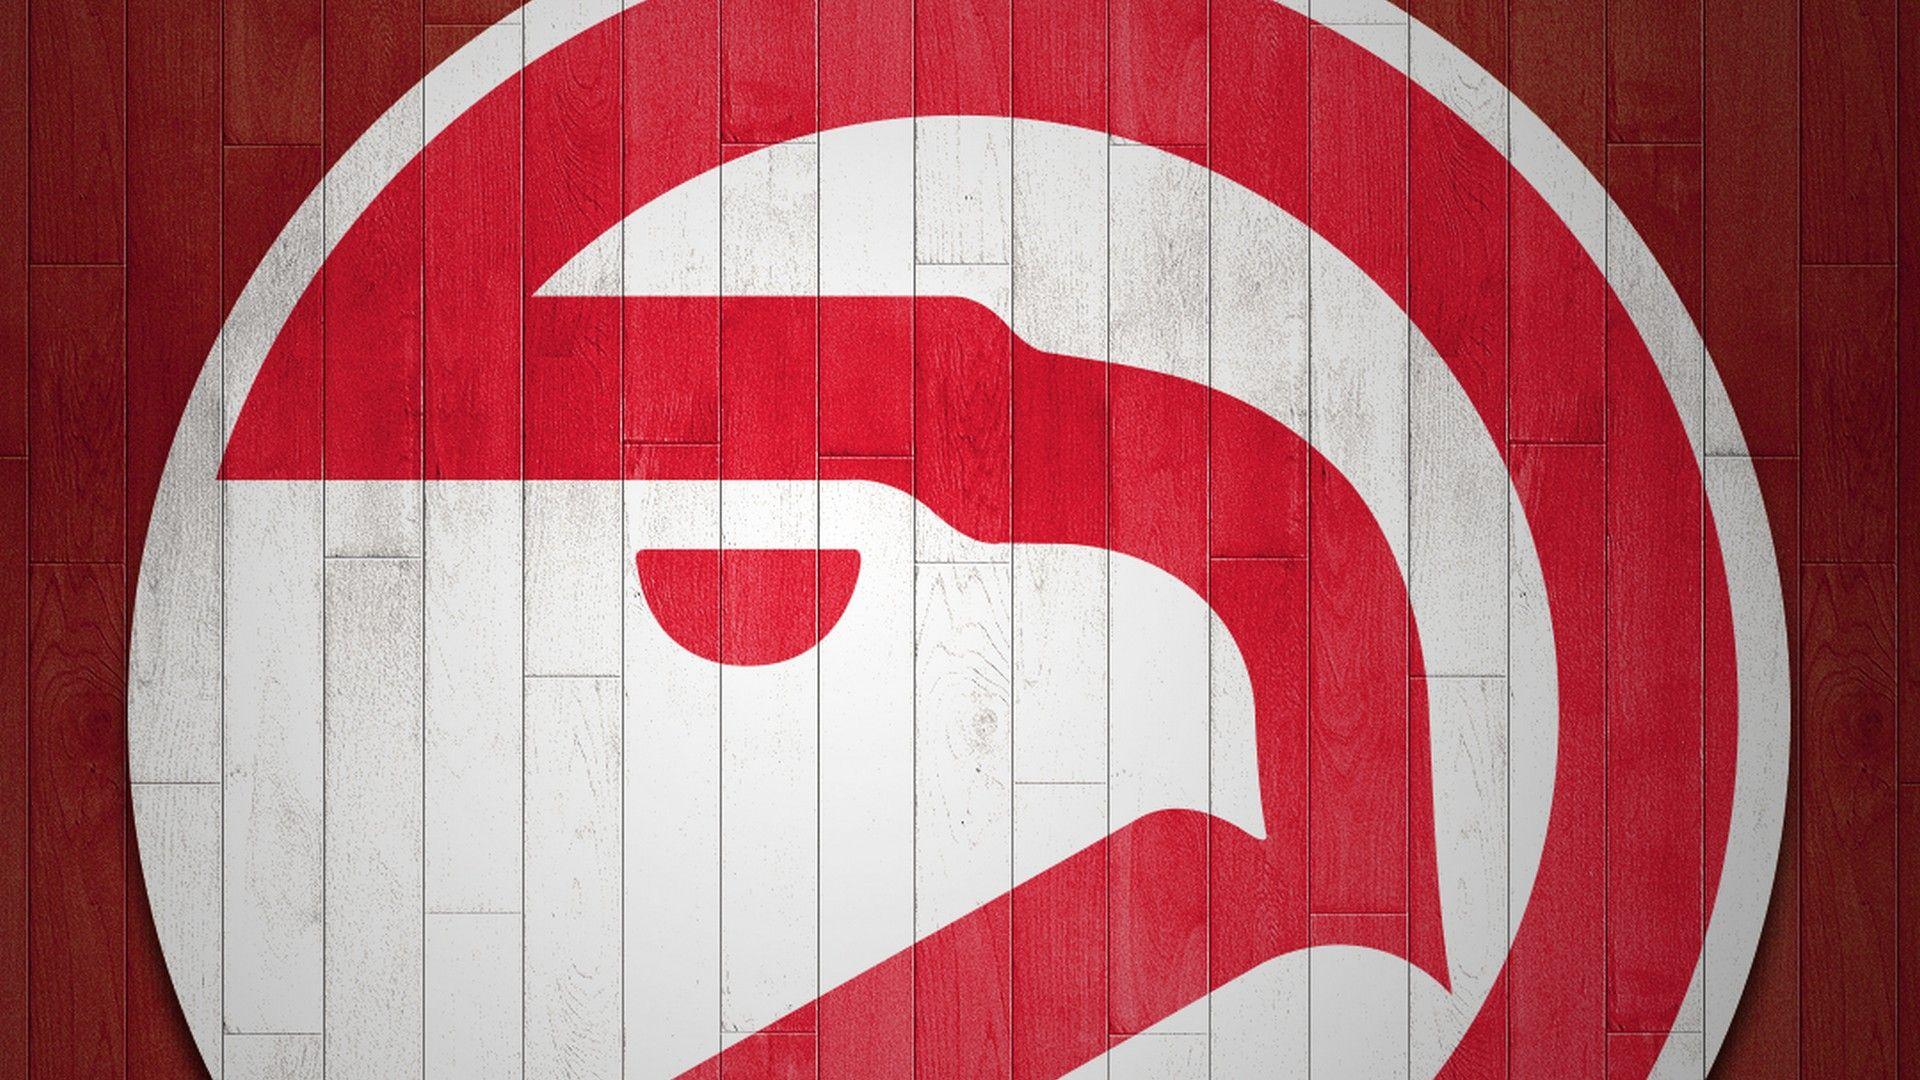 Wallpapers Hd Atlanta Hawks 2021 Basketball Wallpaper Basketball Wallpaper Atlanta Hawks Basketball Wallpapers Hd